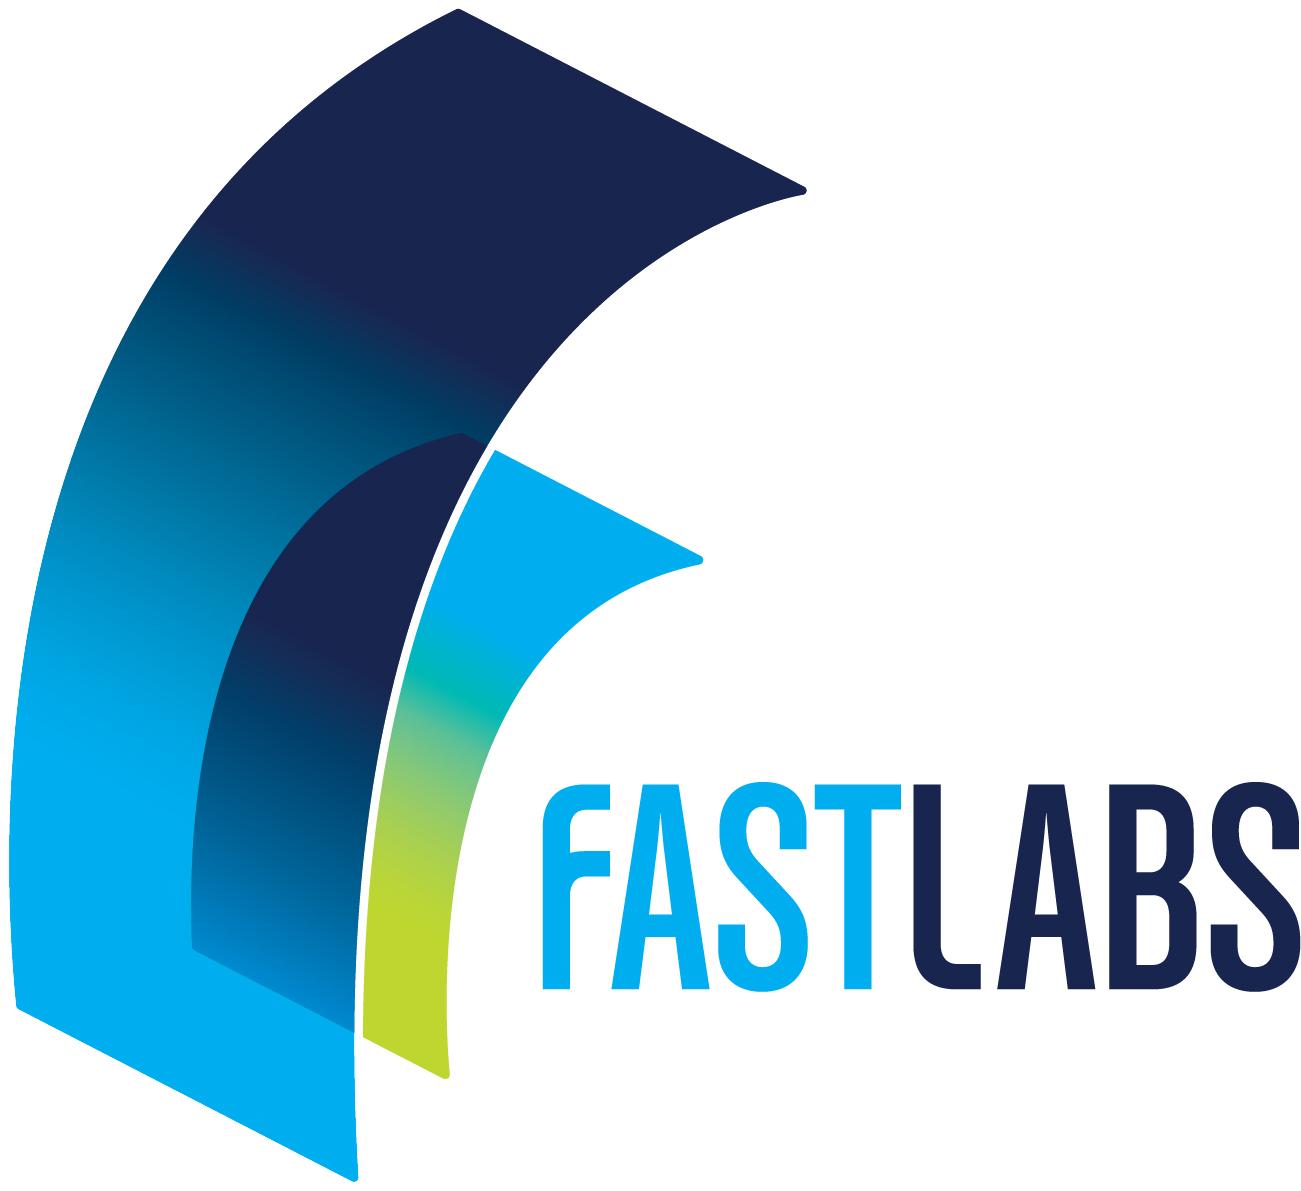 Fast Labs logo